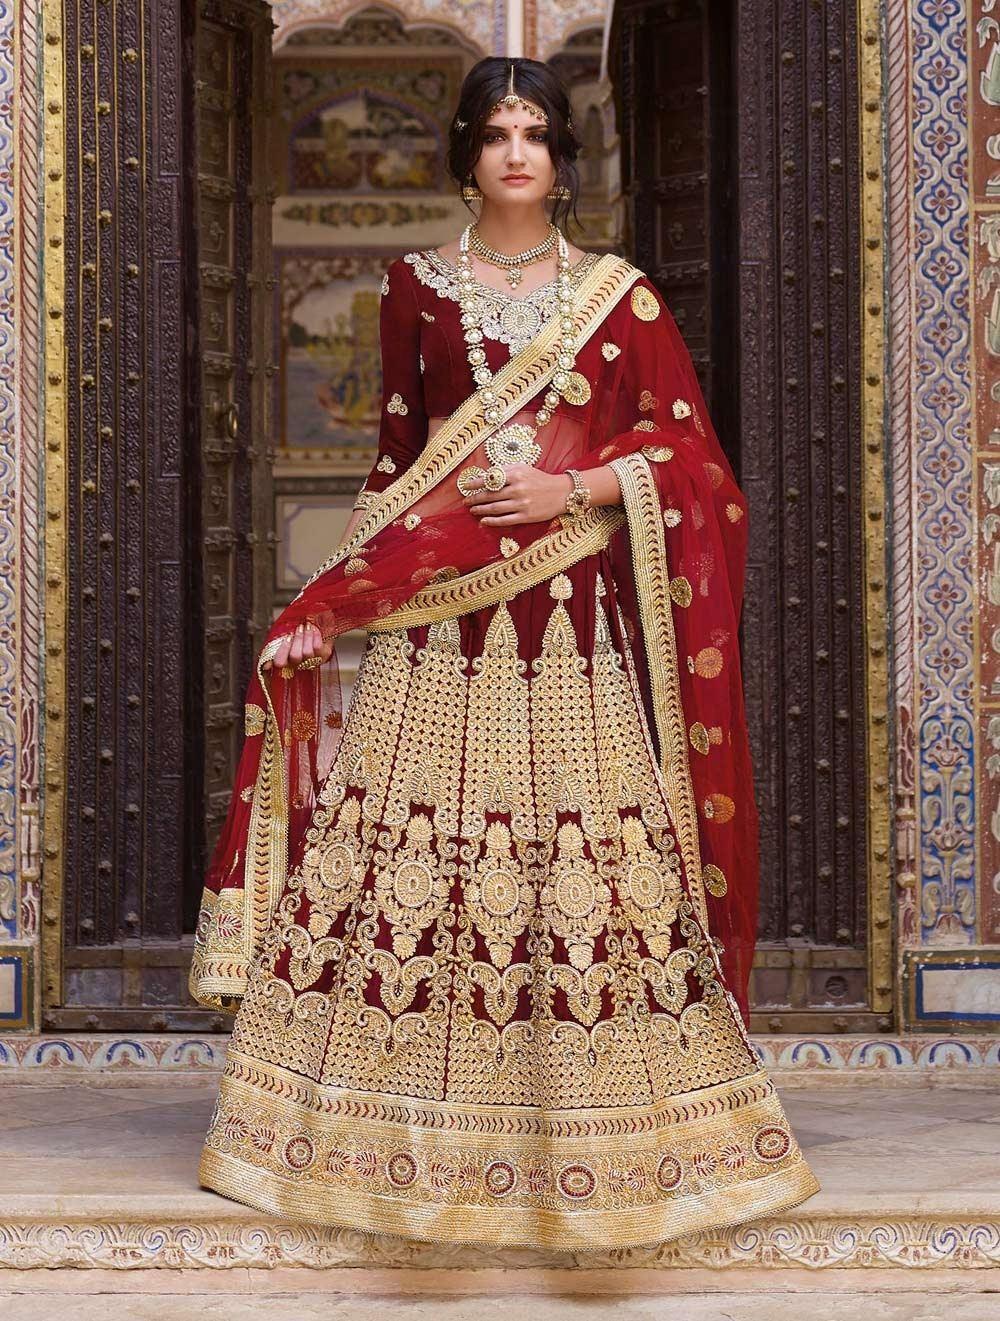 Sabyasachi's bridal wear collection source: wedmegood